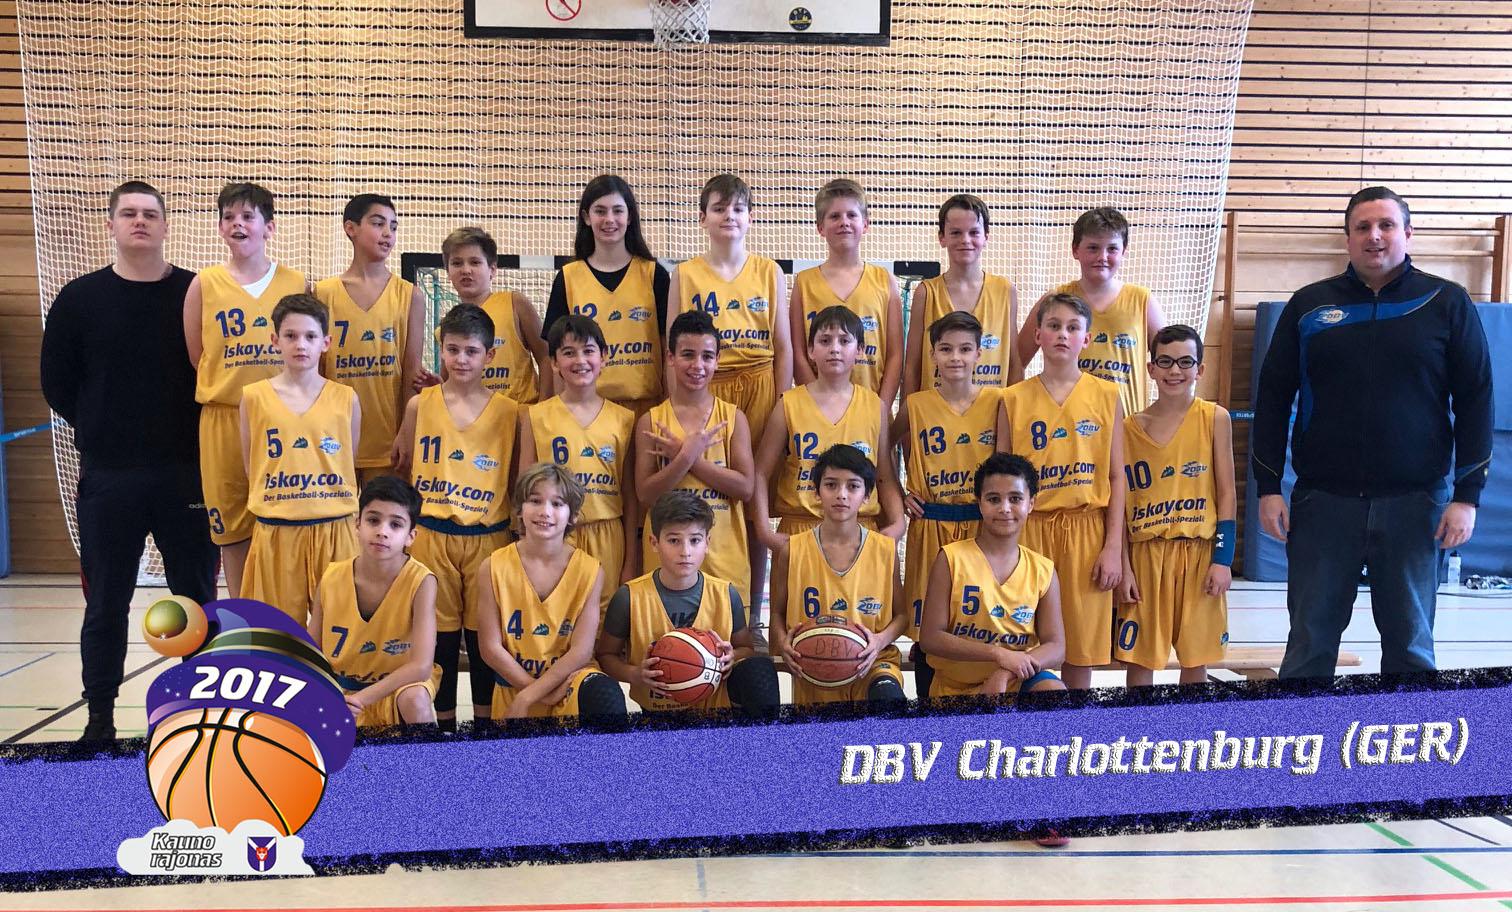 charlotenbug 2006